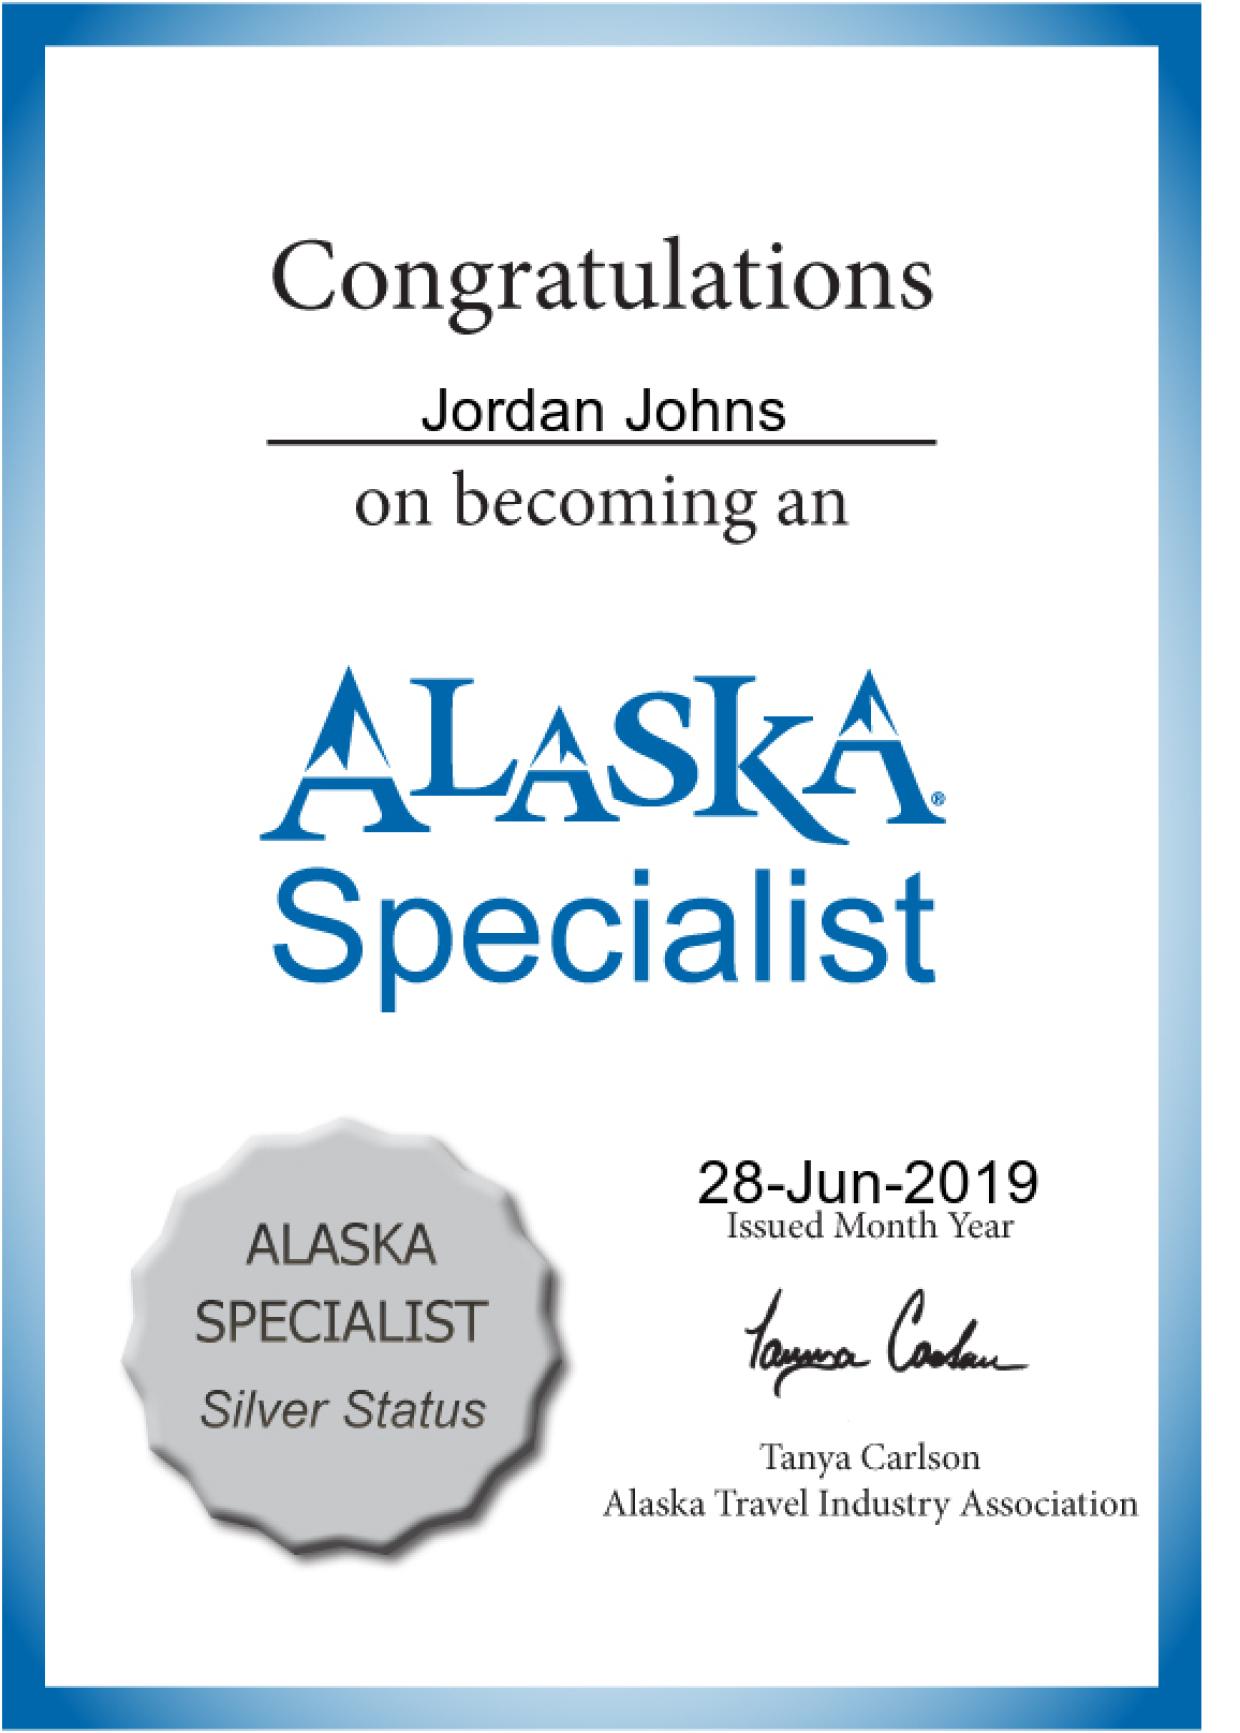 alaska specialist certificate.jpg